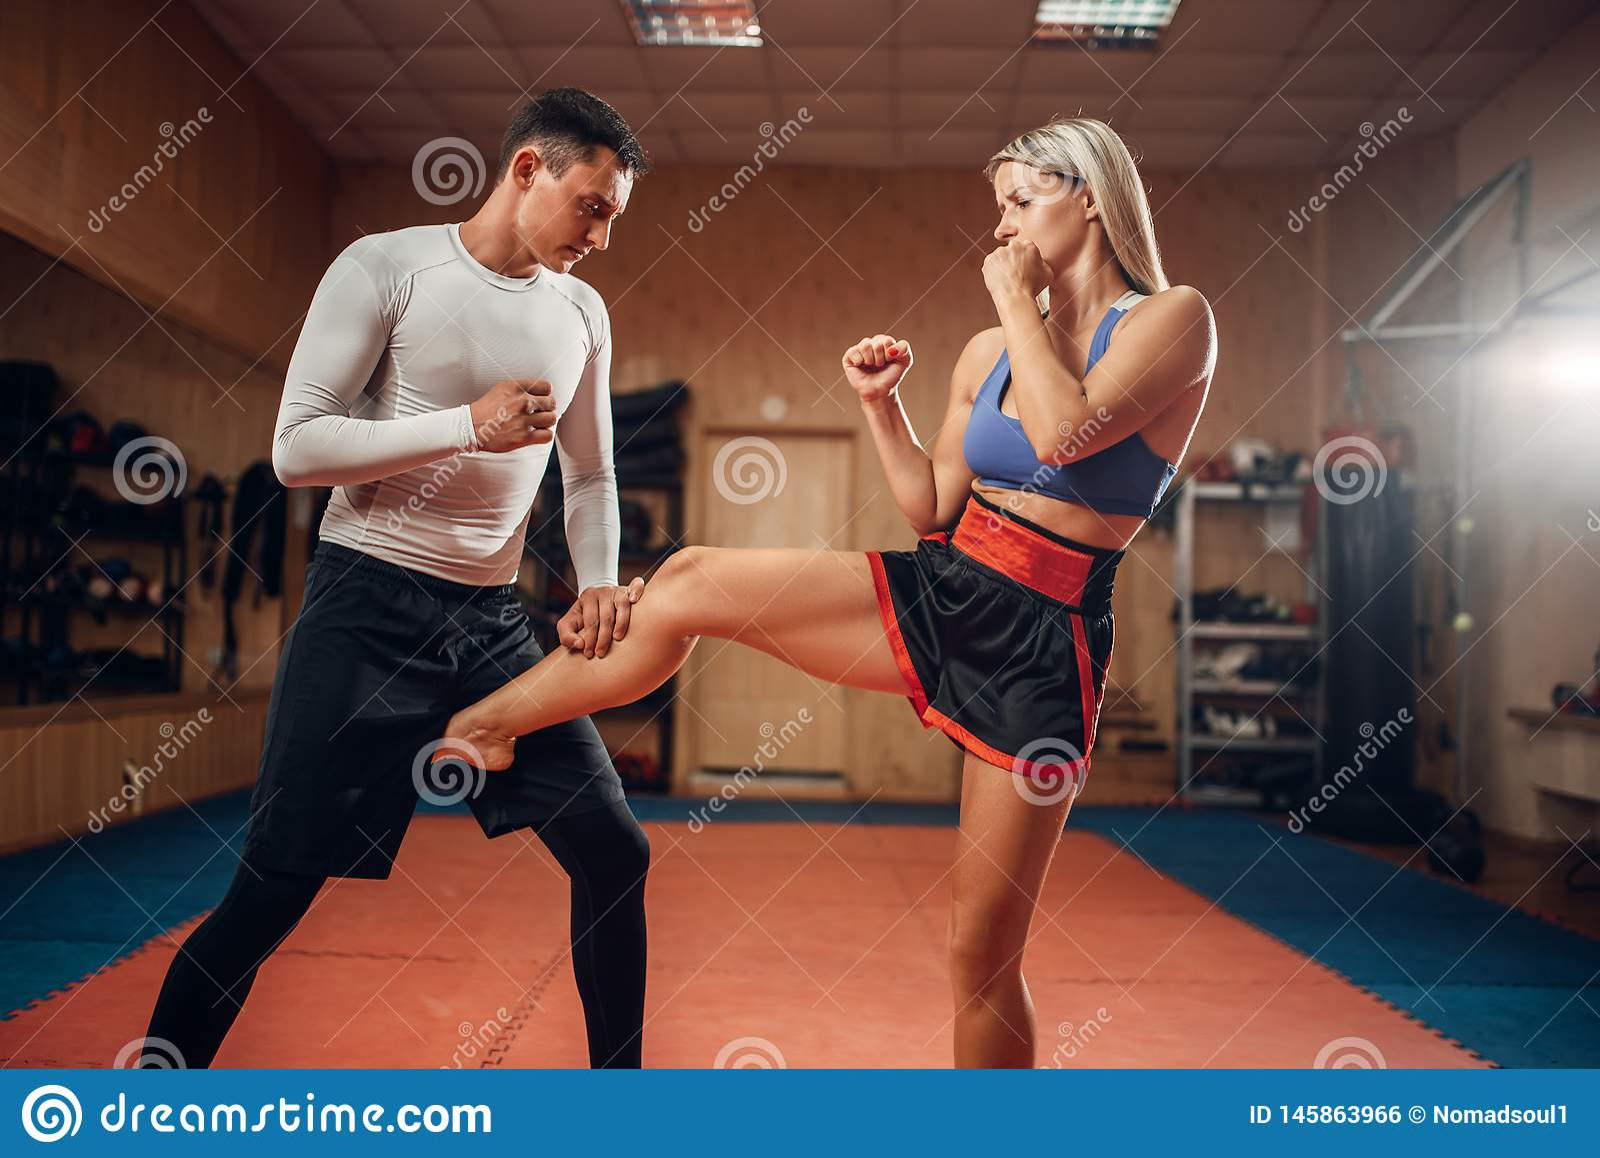 Female Person Makes Kick In Groin, Self Defense Stock